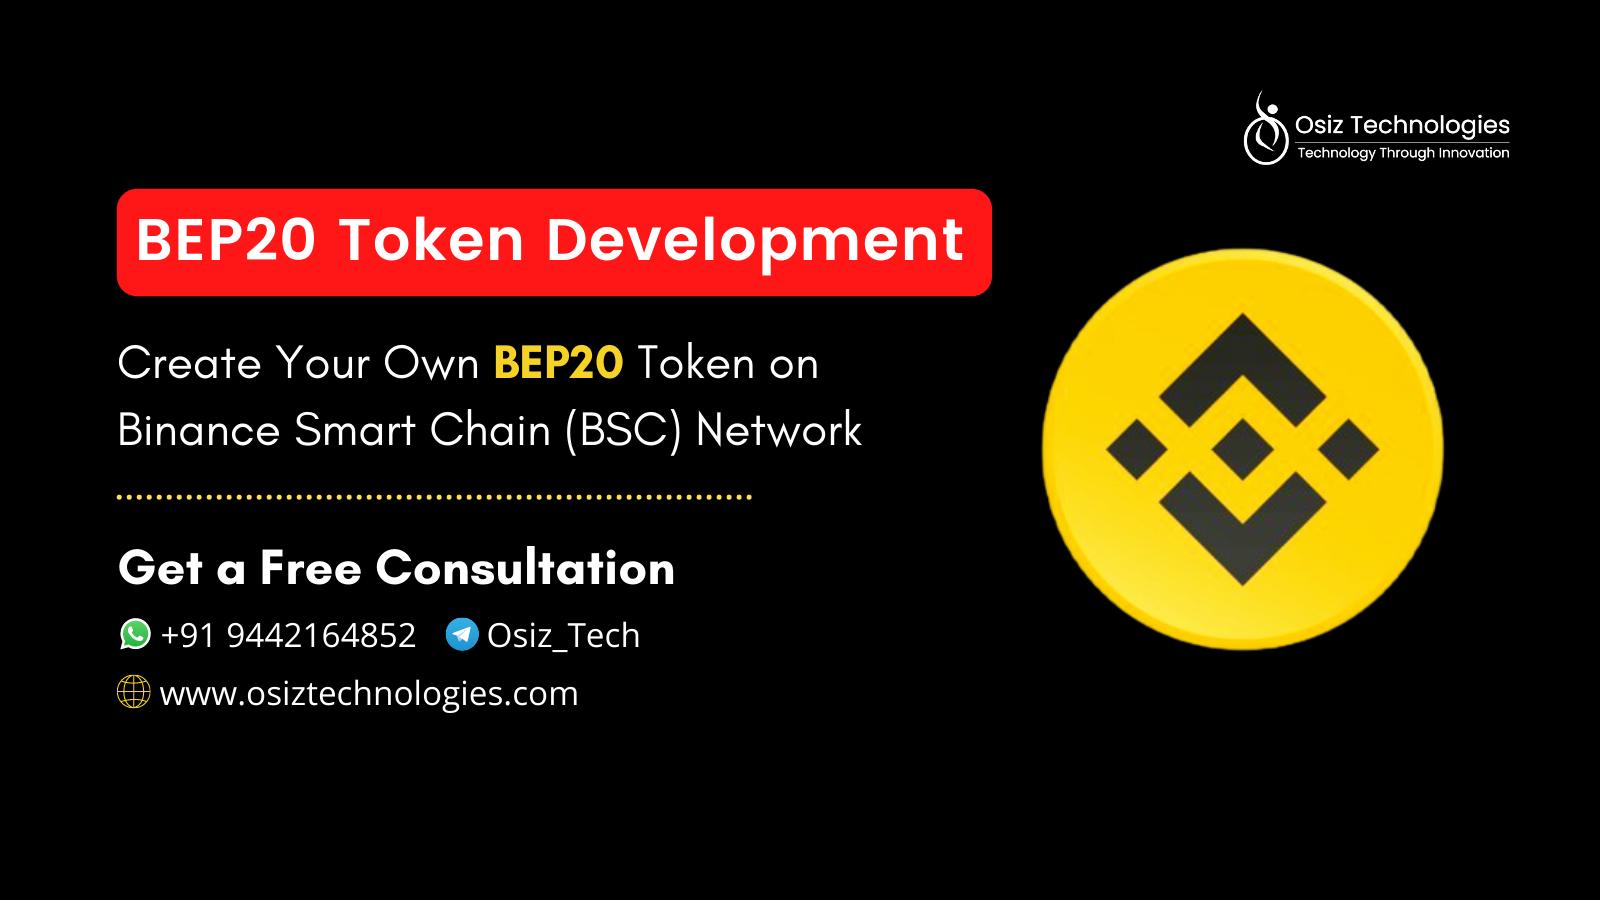 BEP20 Token Development Company - Create Your Own BEP20 Token  on Binance Smart Chain (BSC)